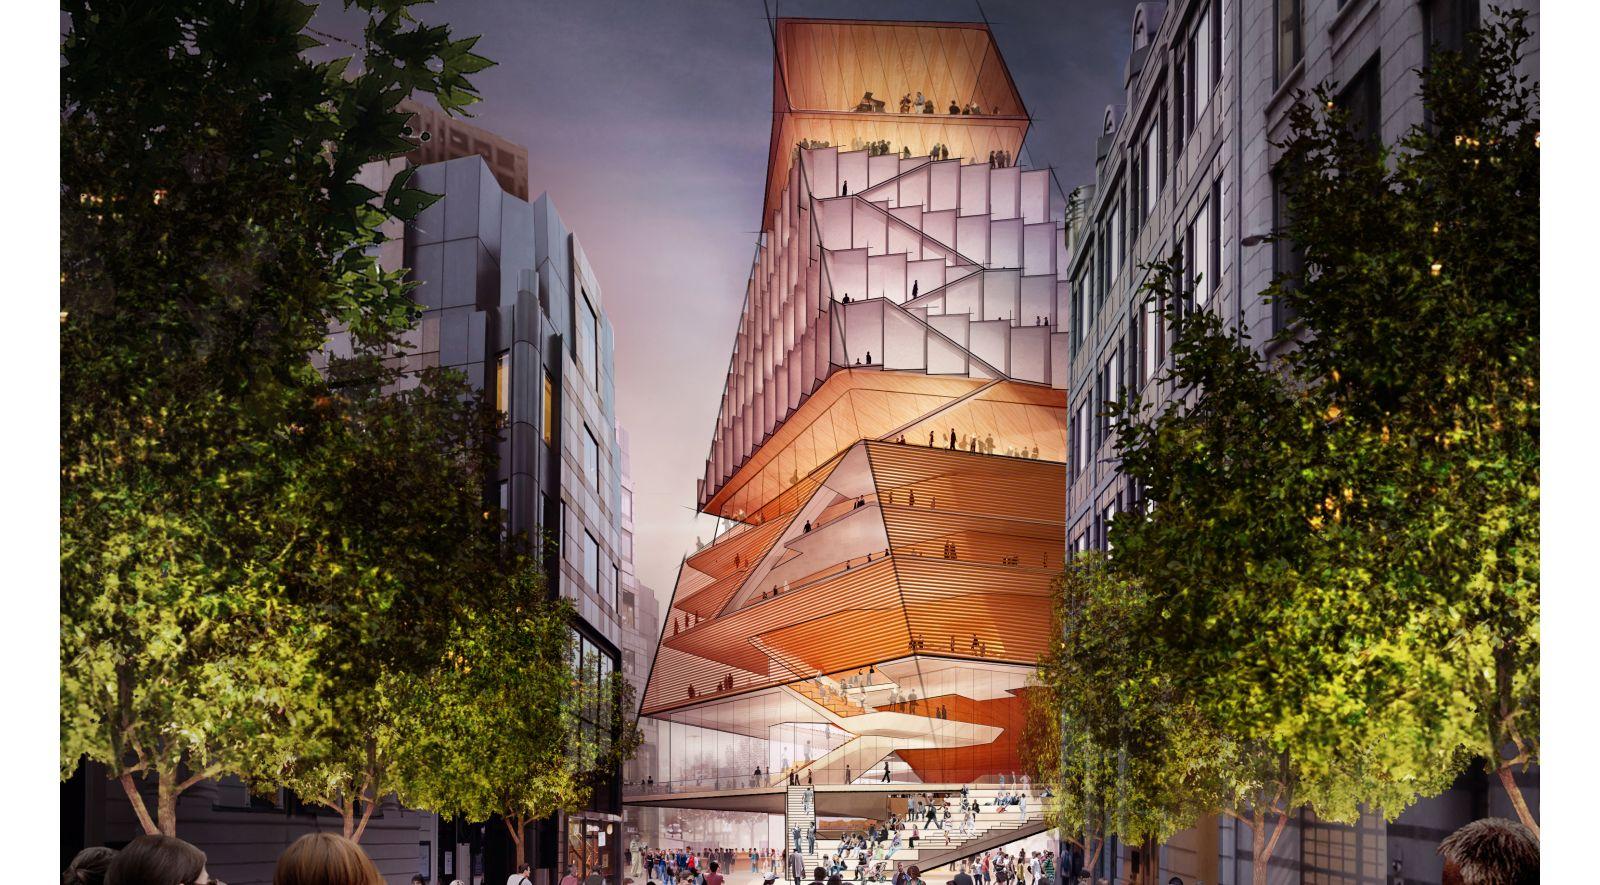 London Centre for Music